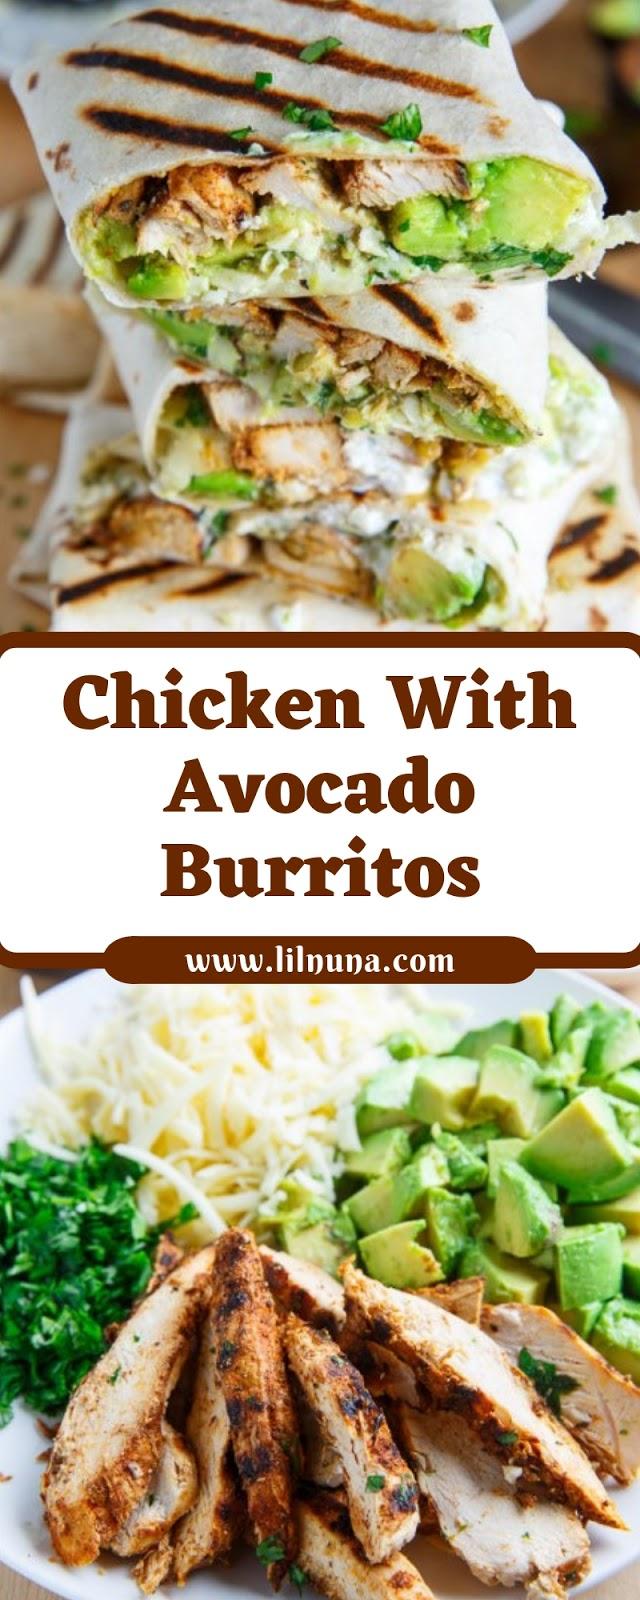 Chicken With Avocado Burritos